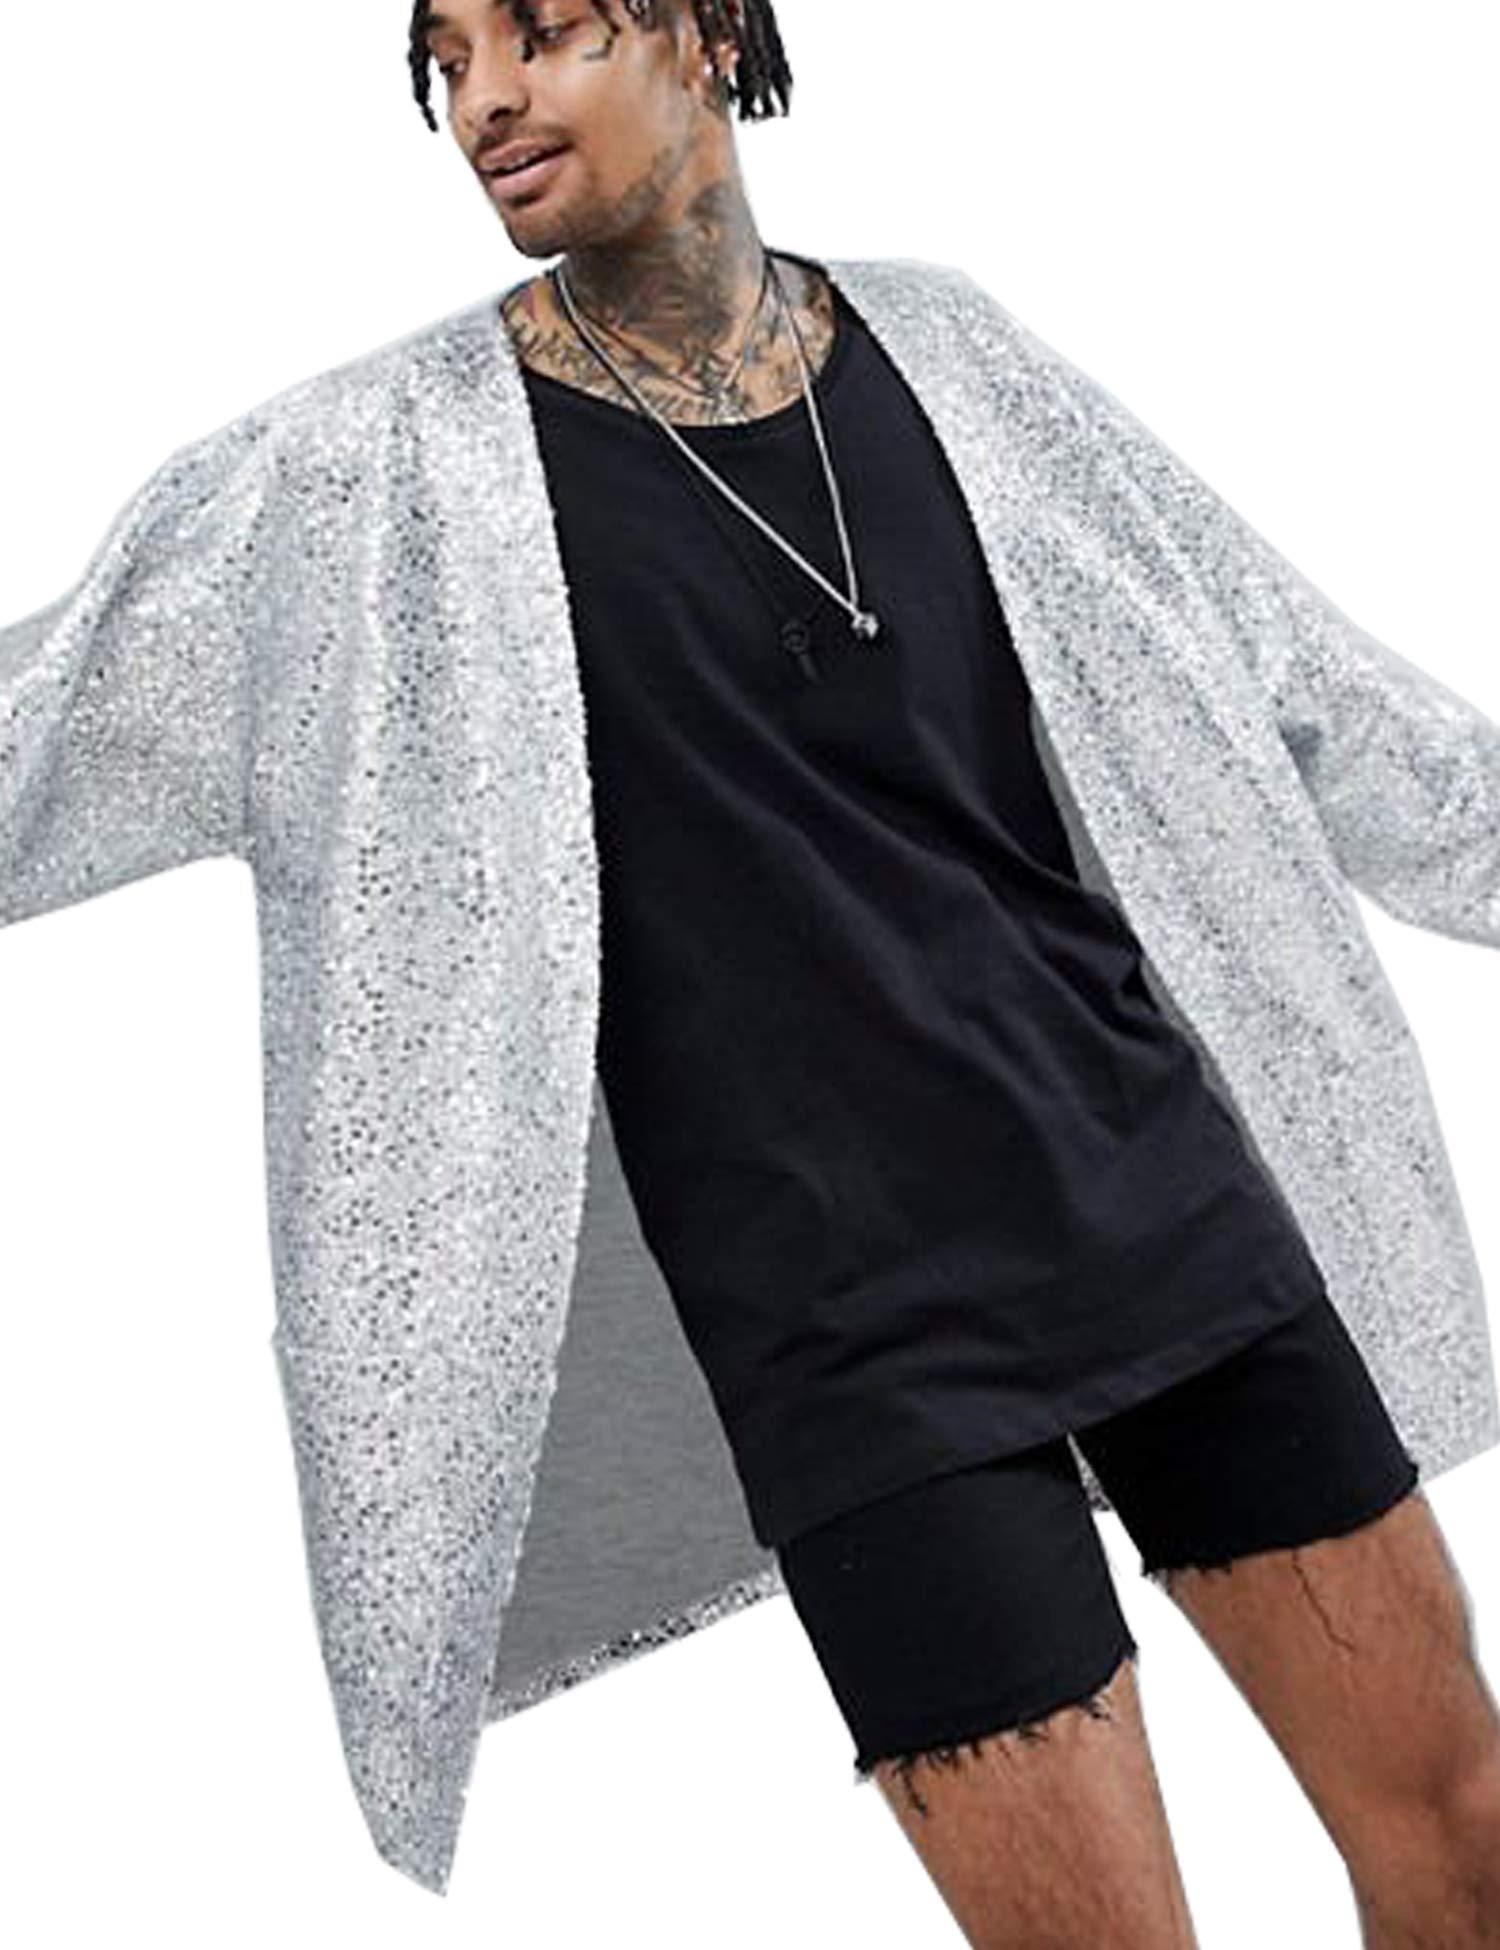 COOFANDY Men's Sequin Cardigan Party Nightclub Hip Hop Stylish Open Front Cape Cloak